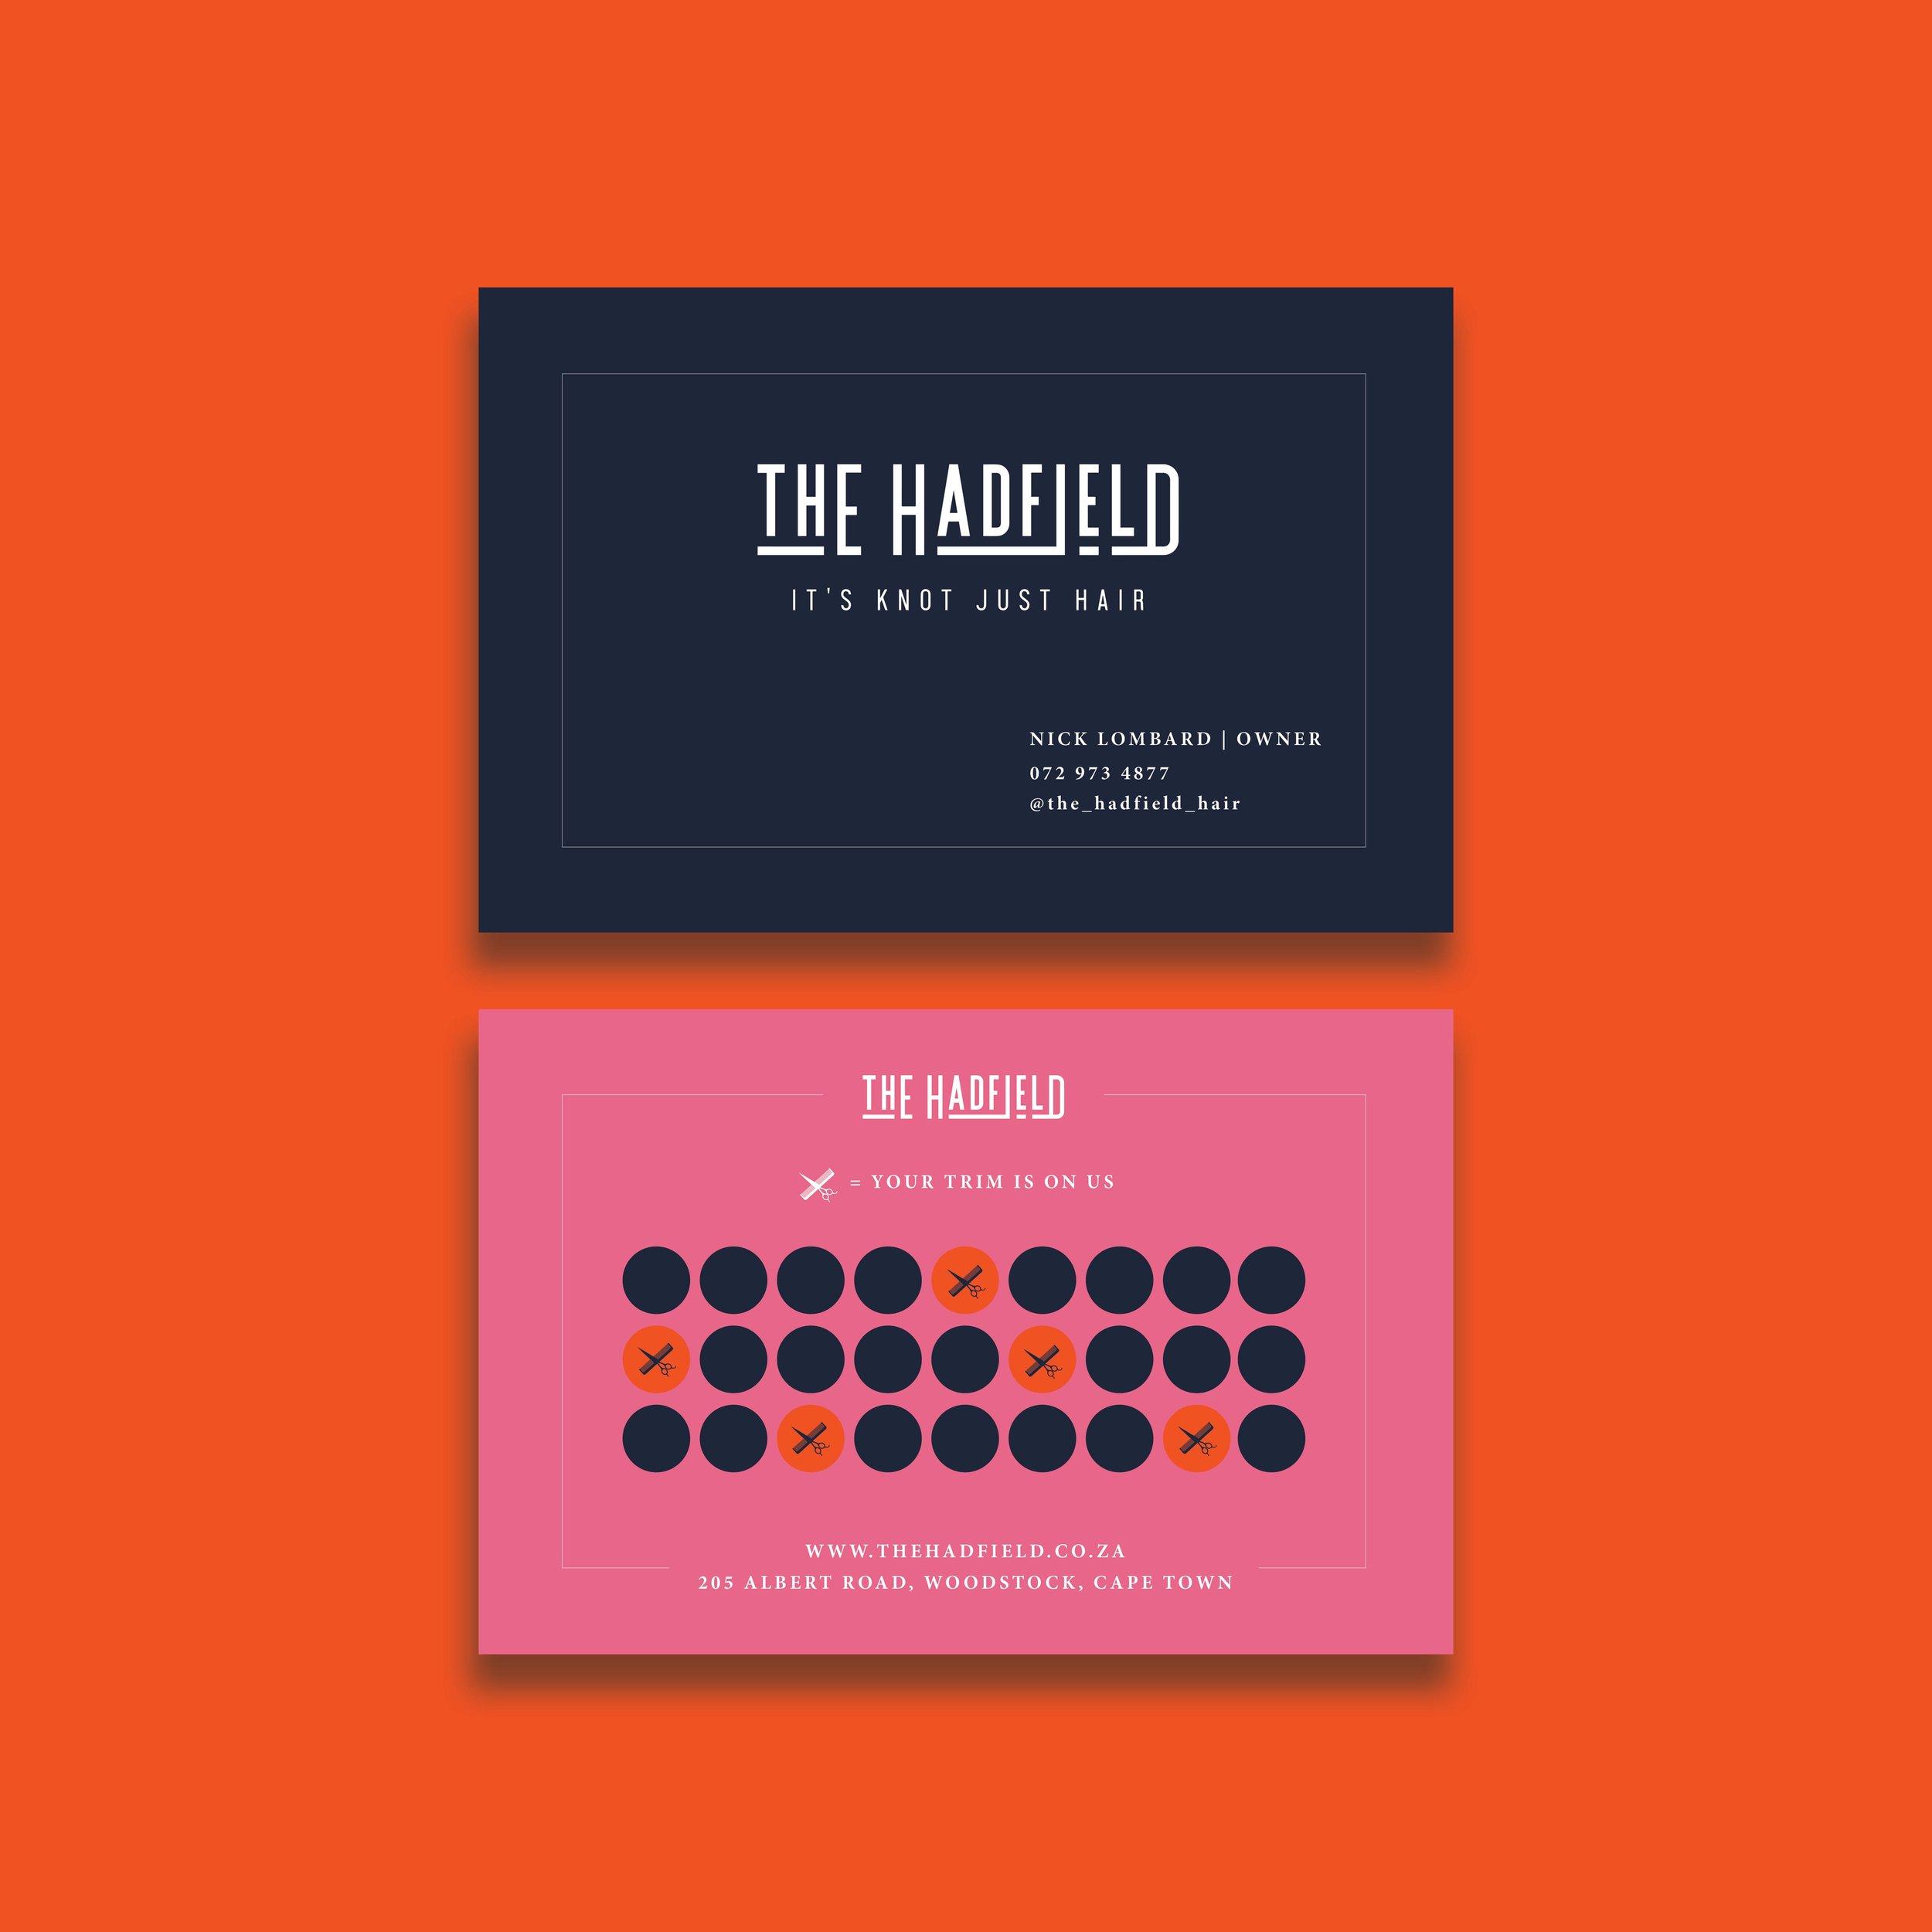 The-Hadfield-Hair-Salon-Woodstock-Cape-Town-2.jpg